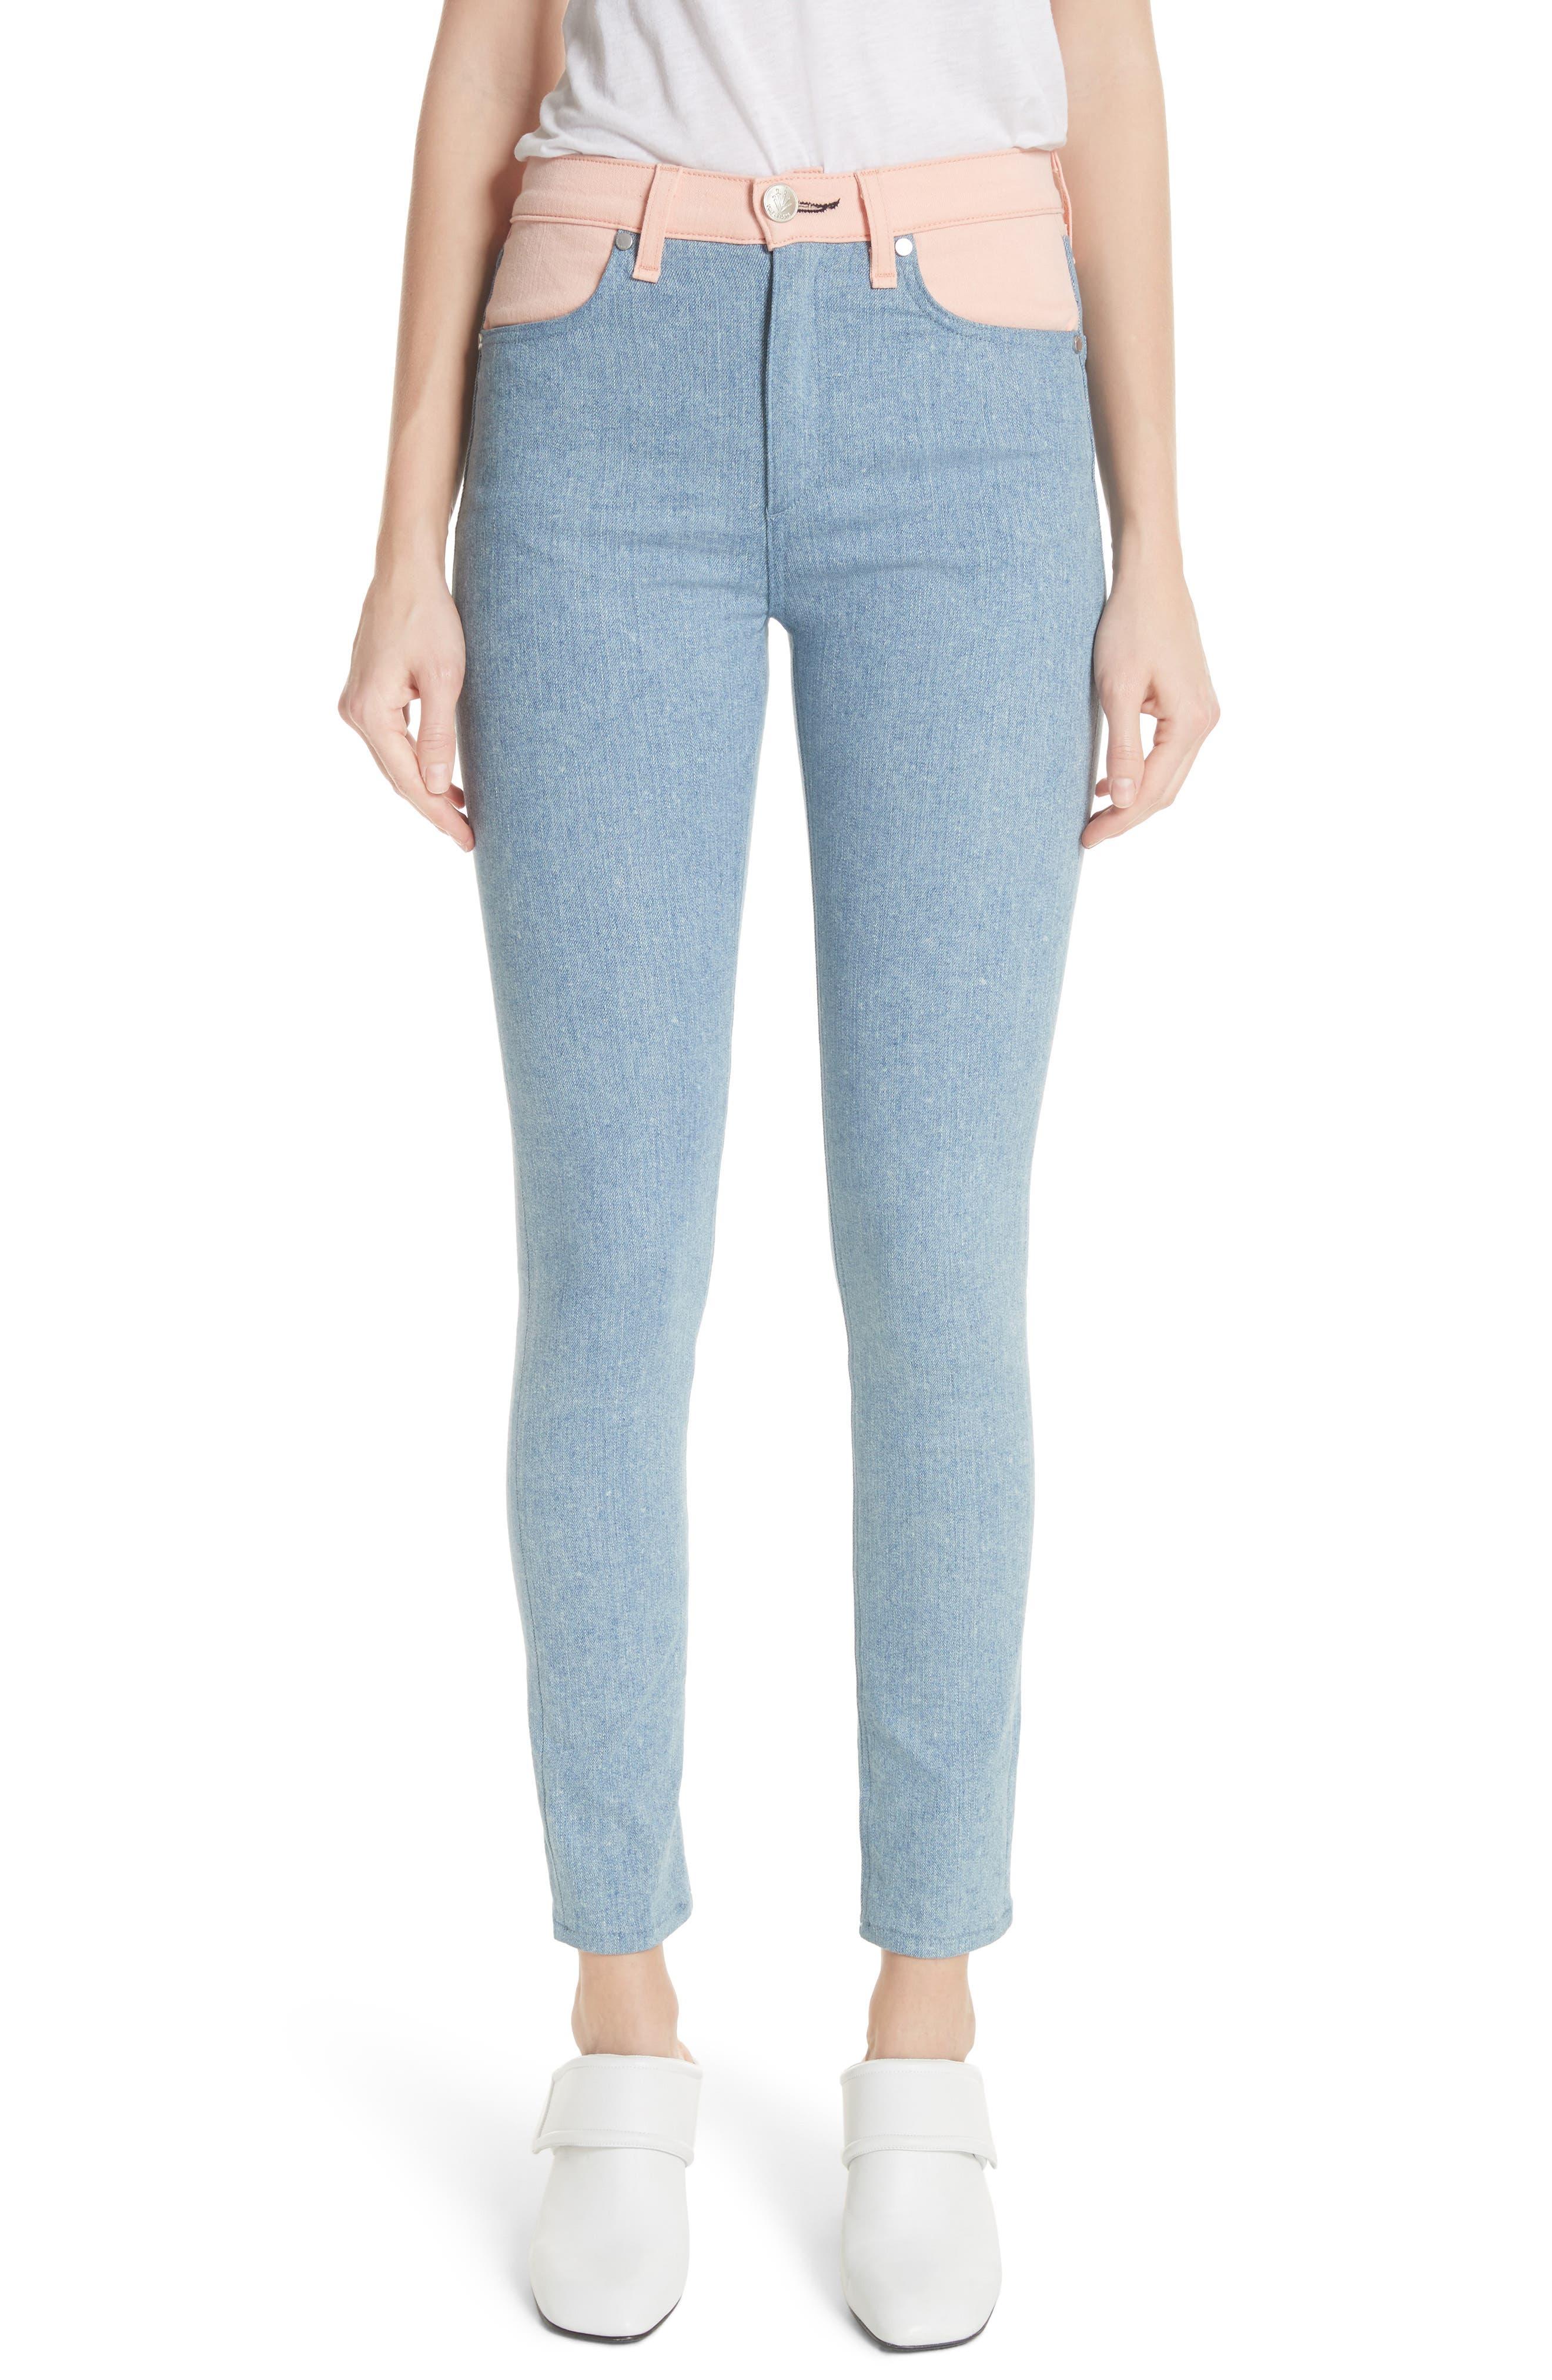 Phila Skinny Jeans,                         Main,                         color, 450